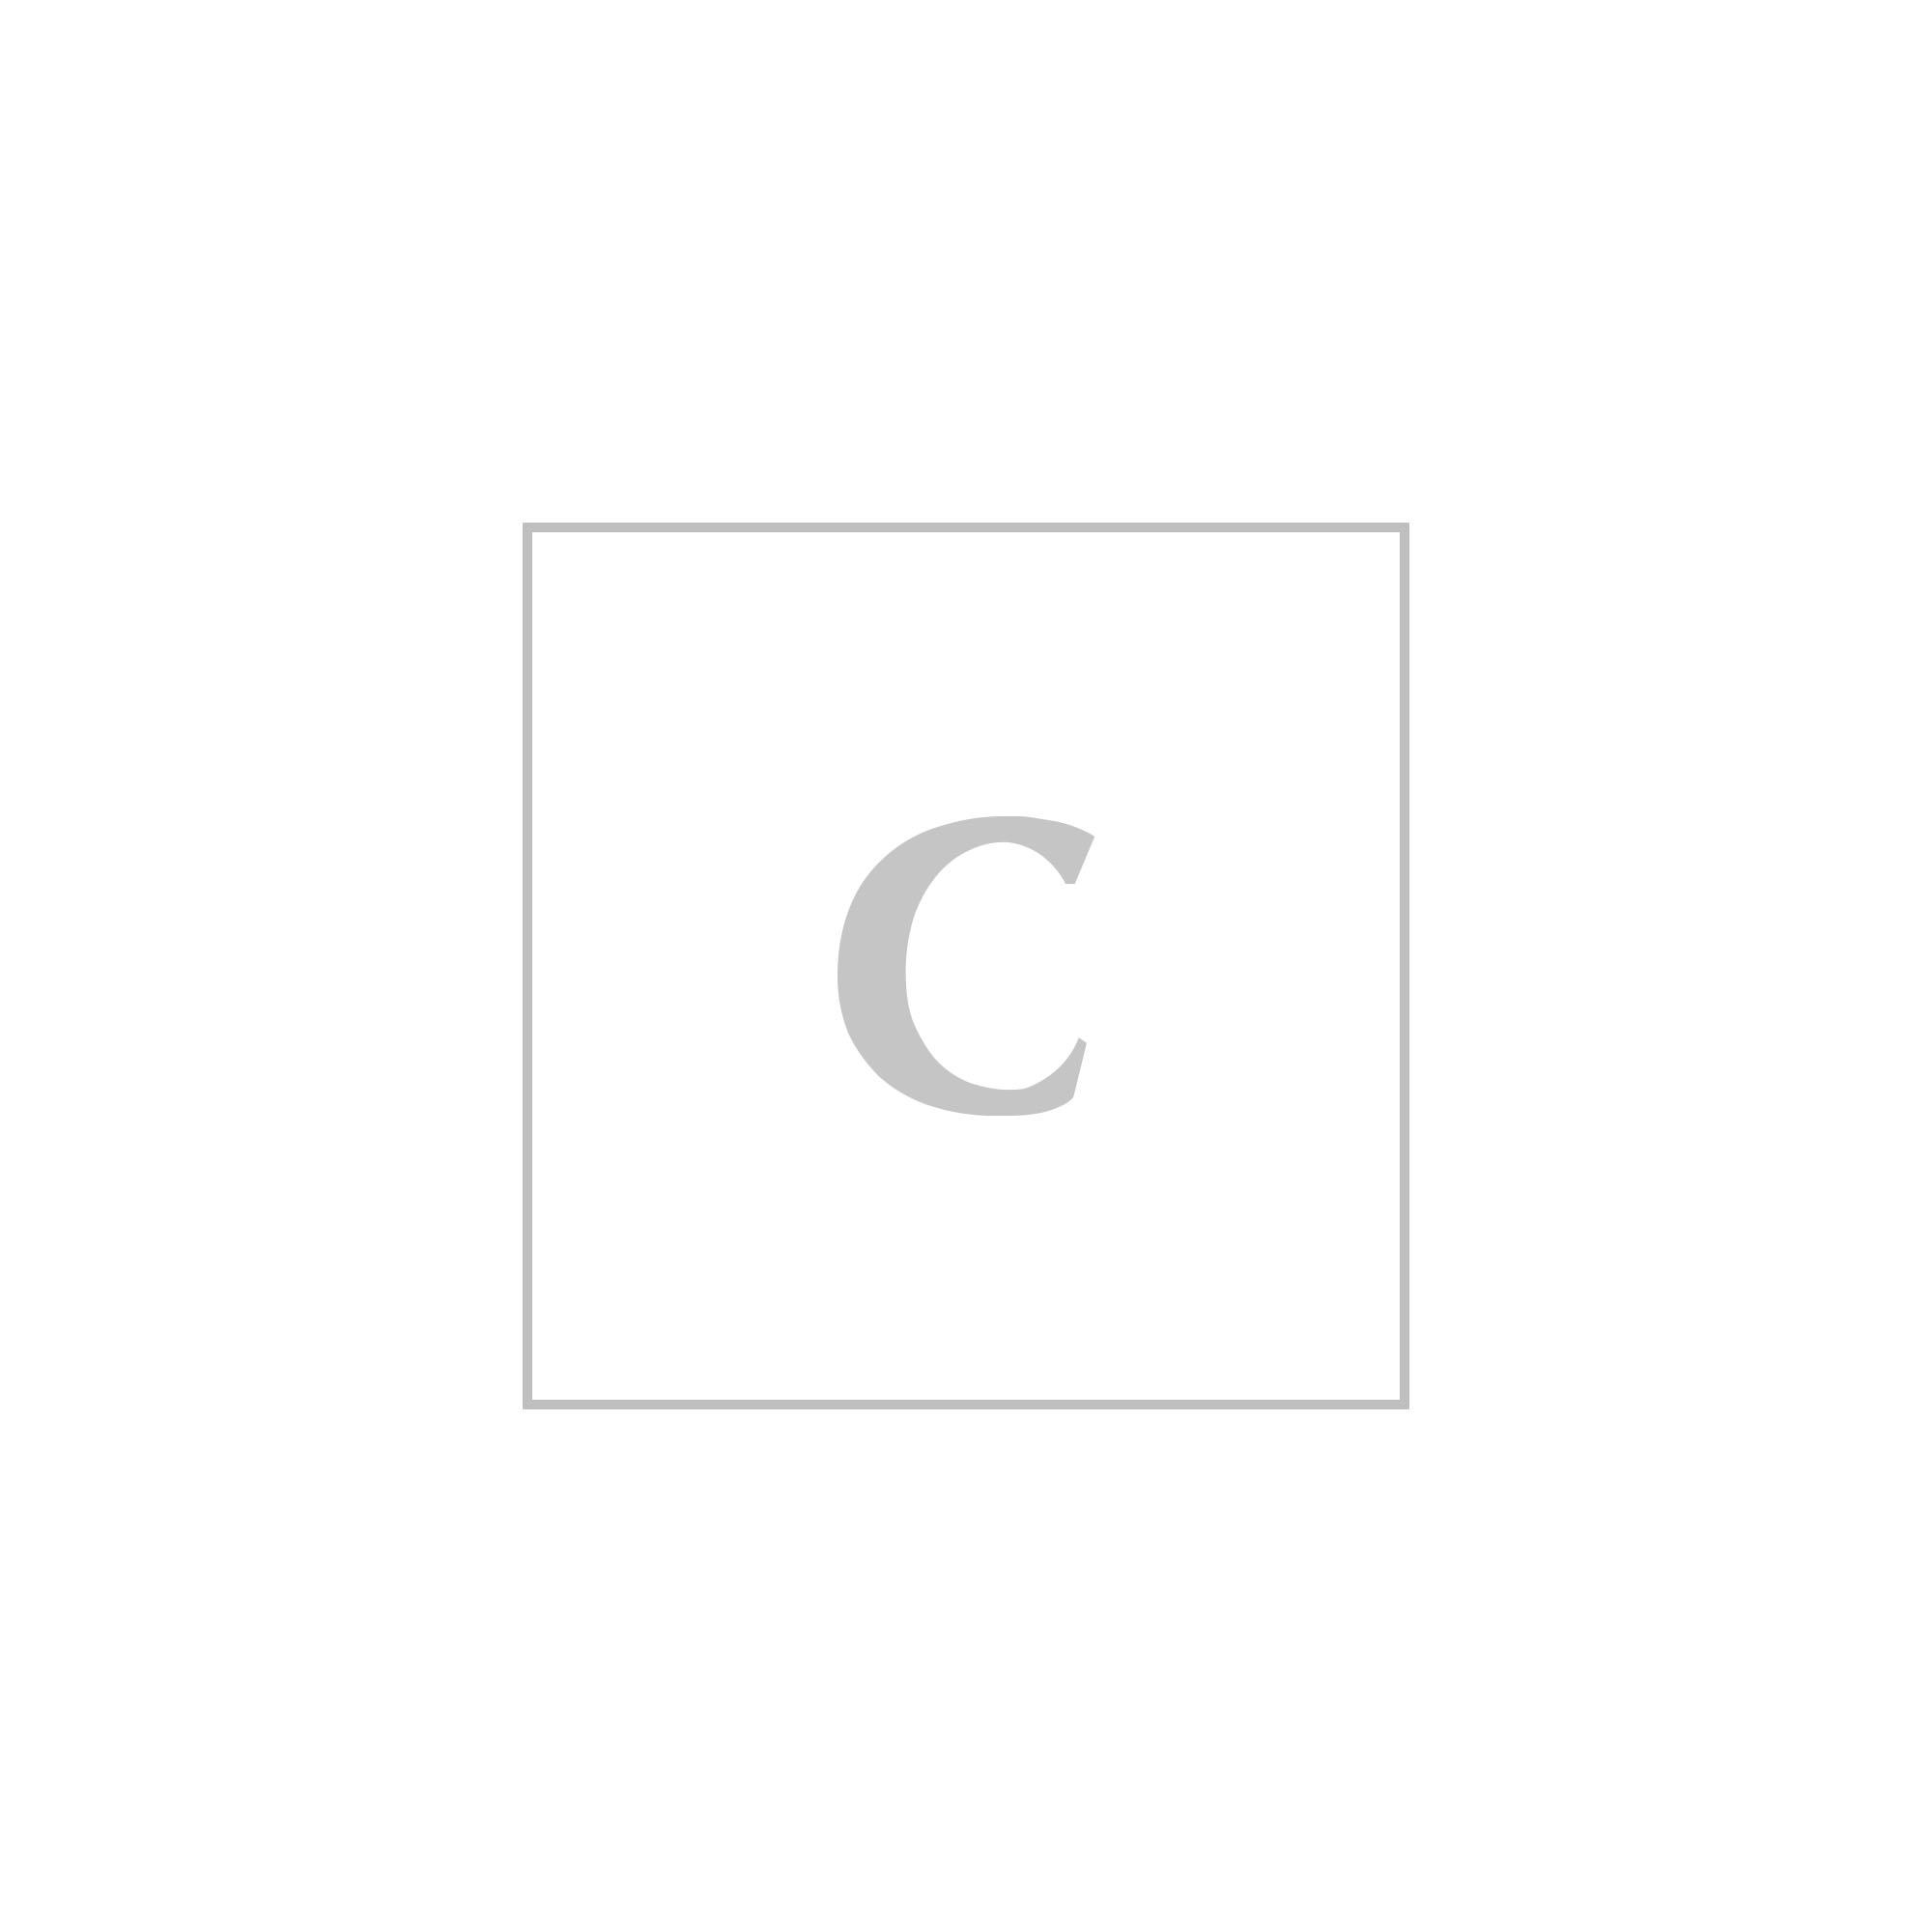 Dolce & gabbana portachiavi pelle dauphine